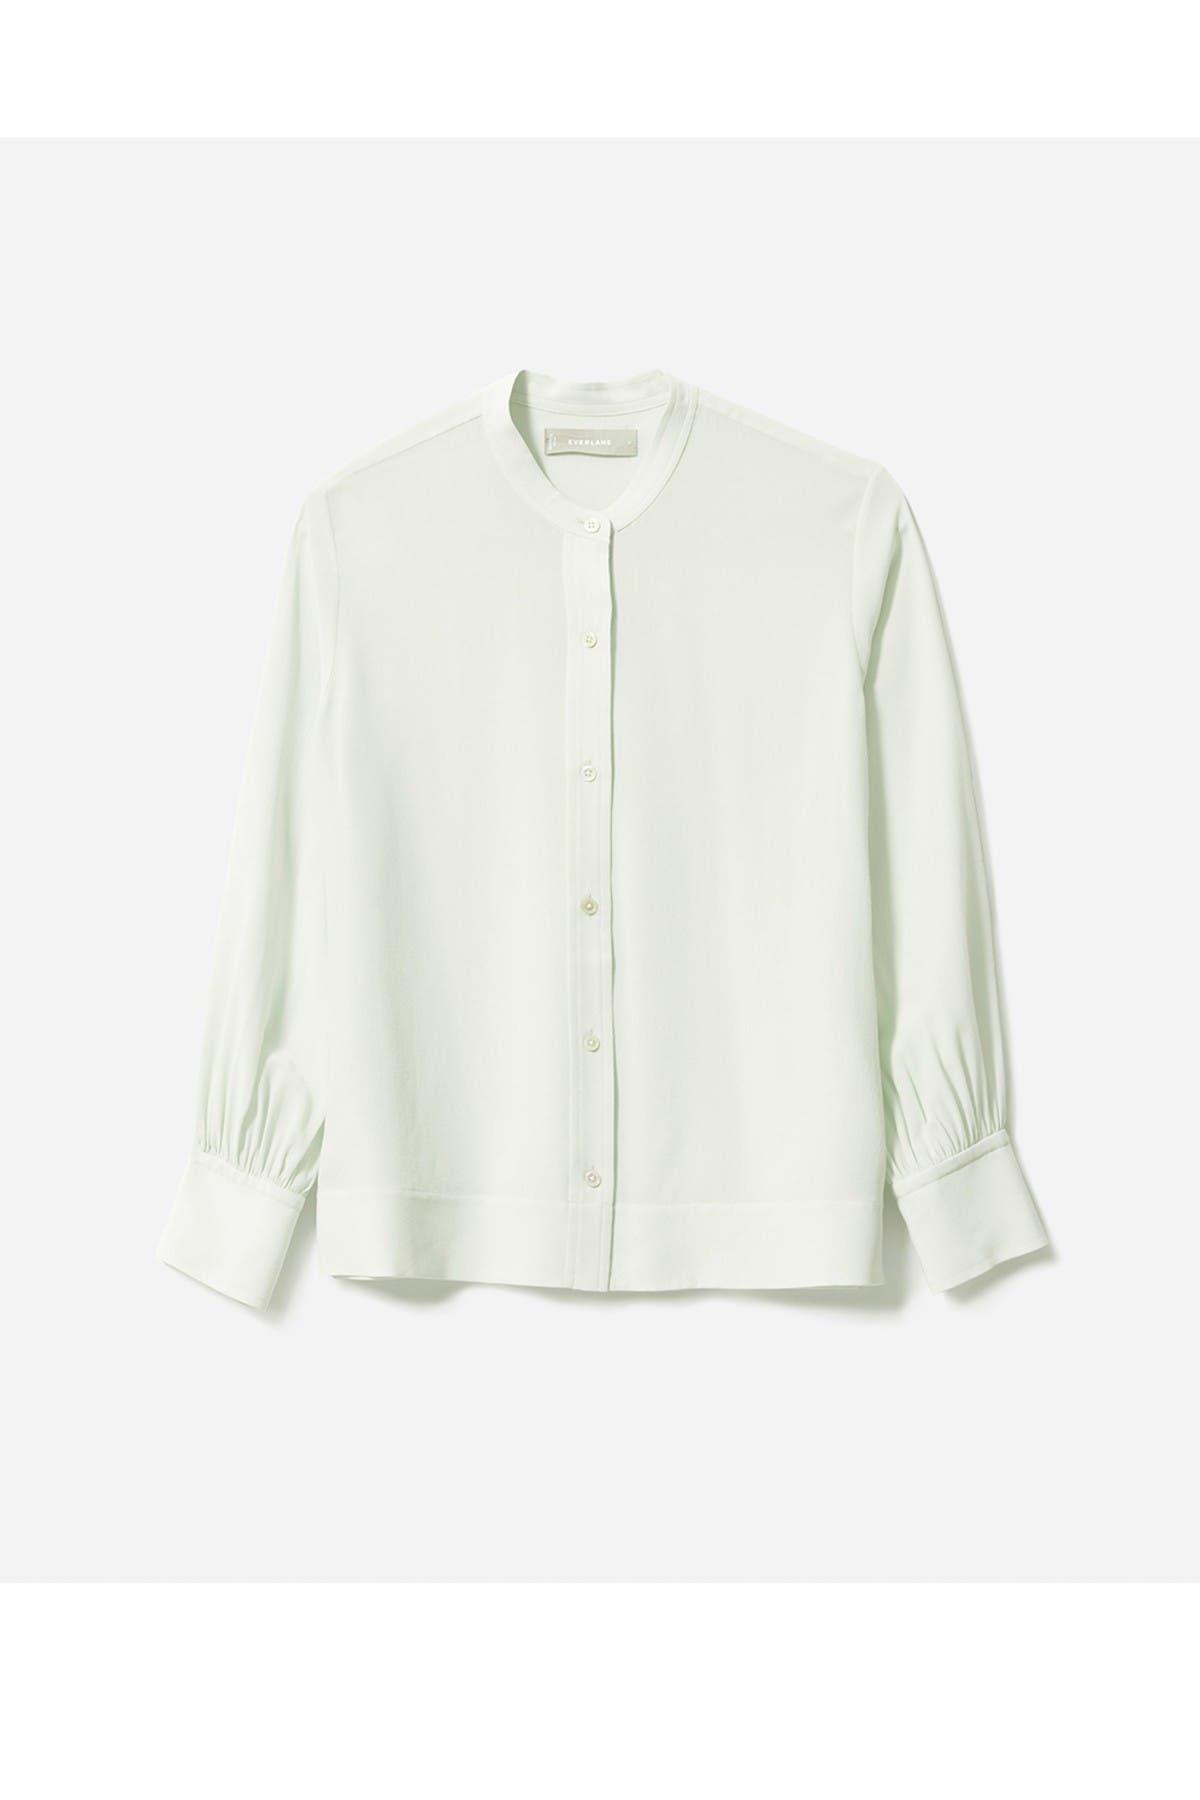 Image of EVERLANE The Clean Silk Blouson Shirt